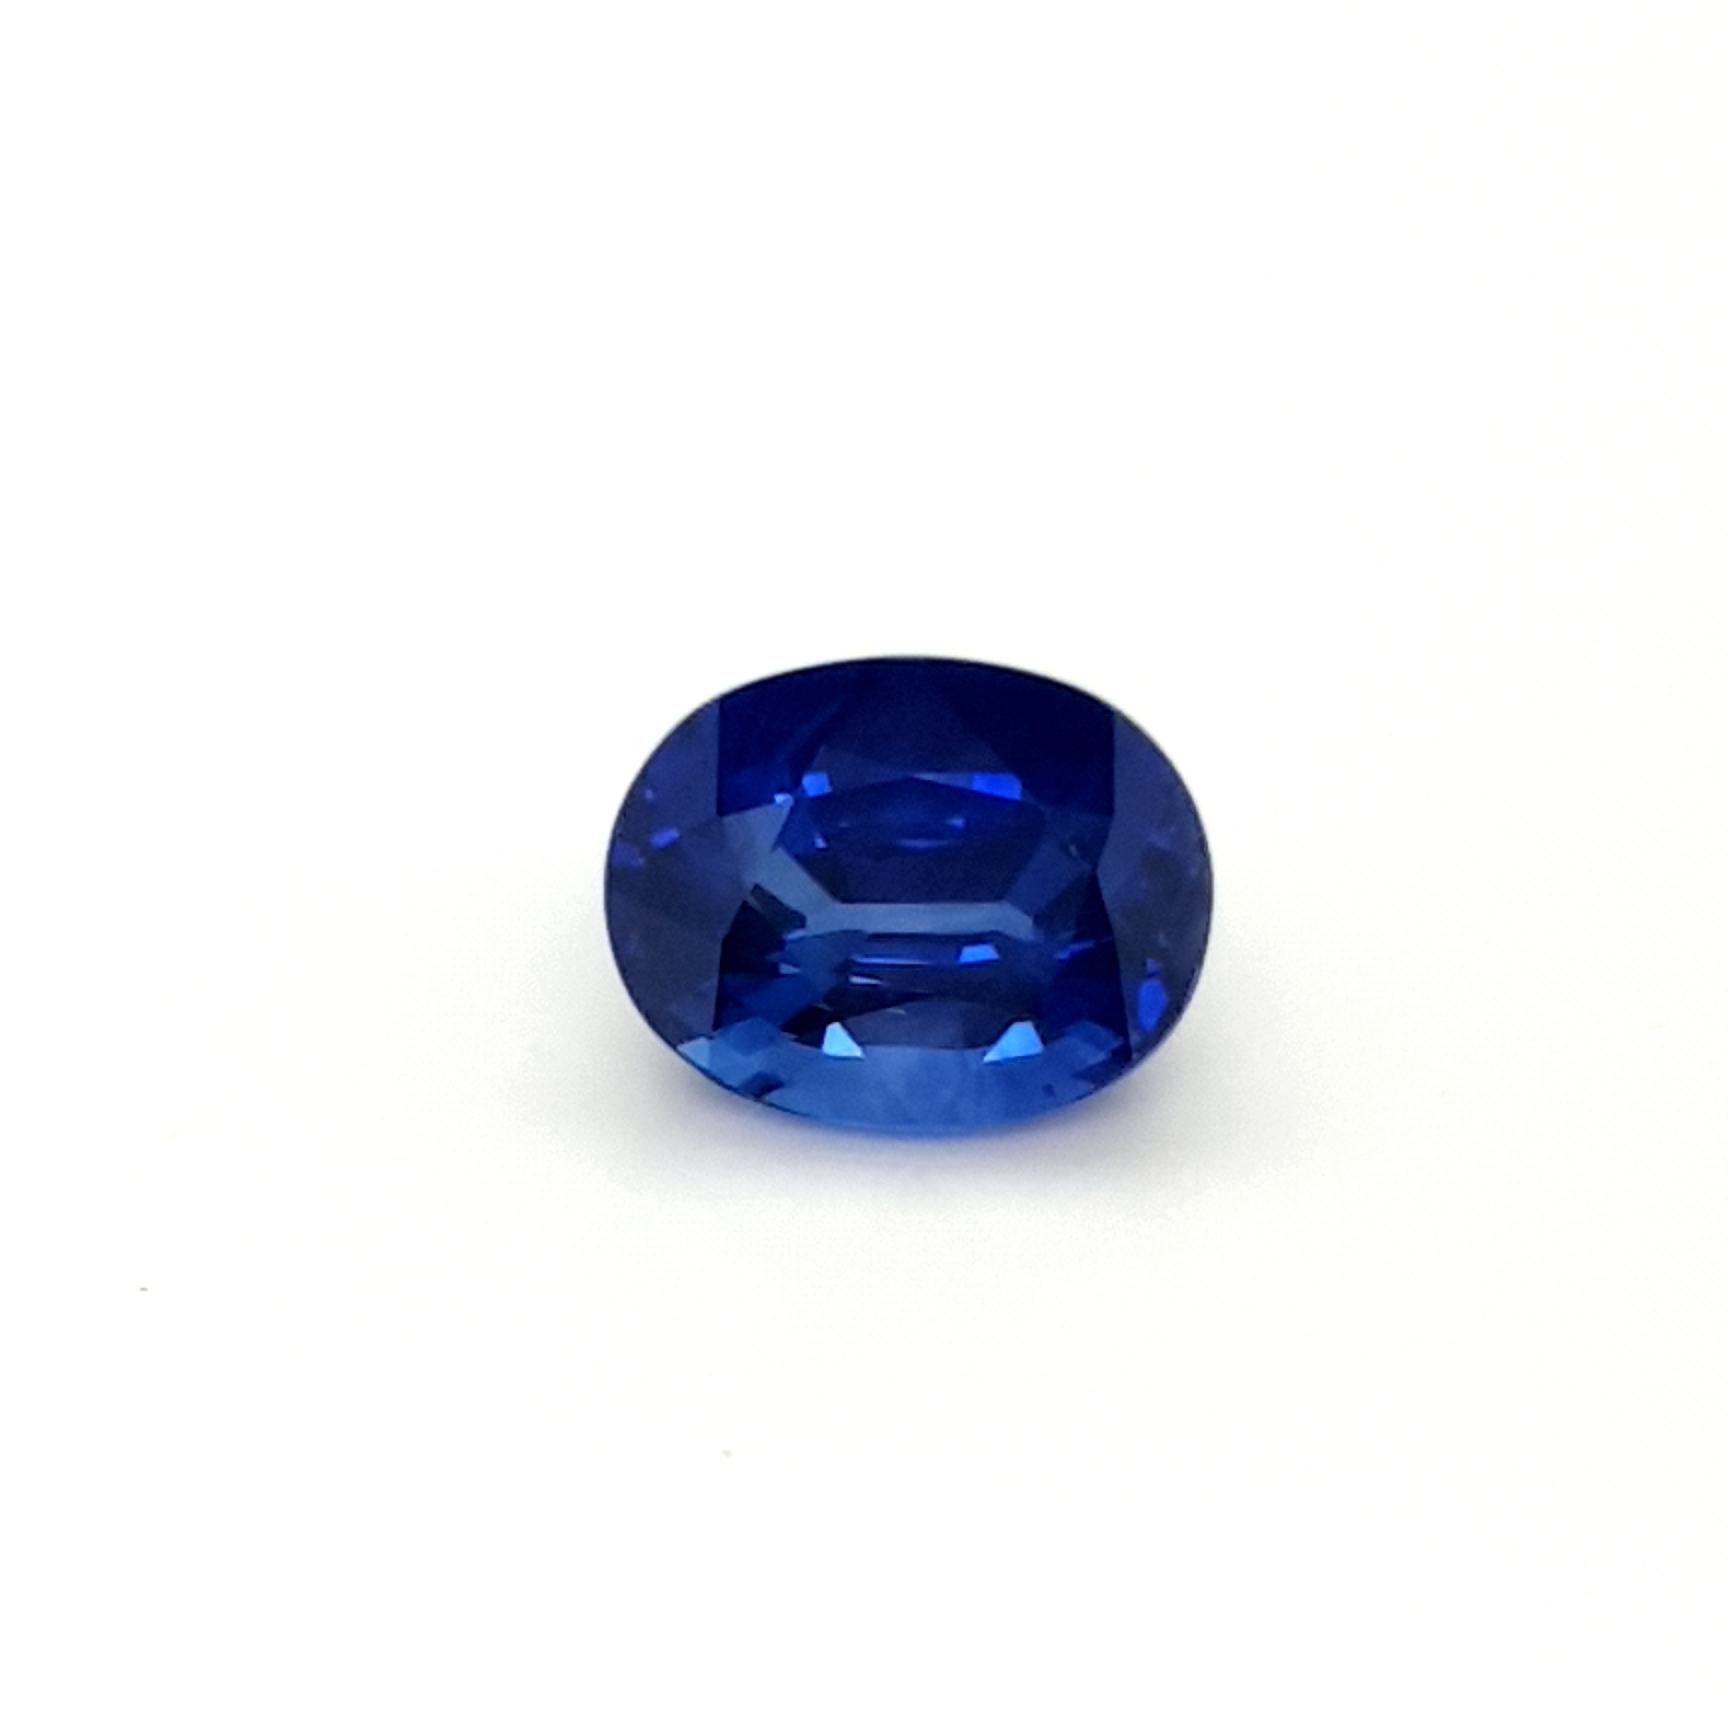 5,28ct. Sapphire Ceylon cert. SAK12D7 ClaudiaHamann__2021-06-02-18-35-00